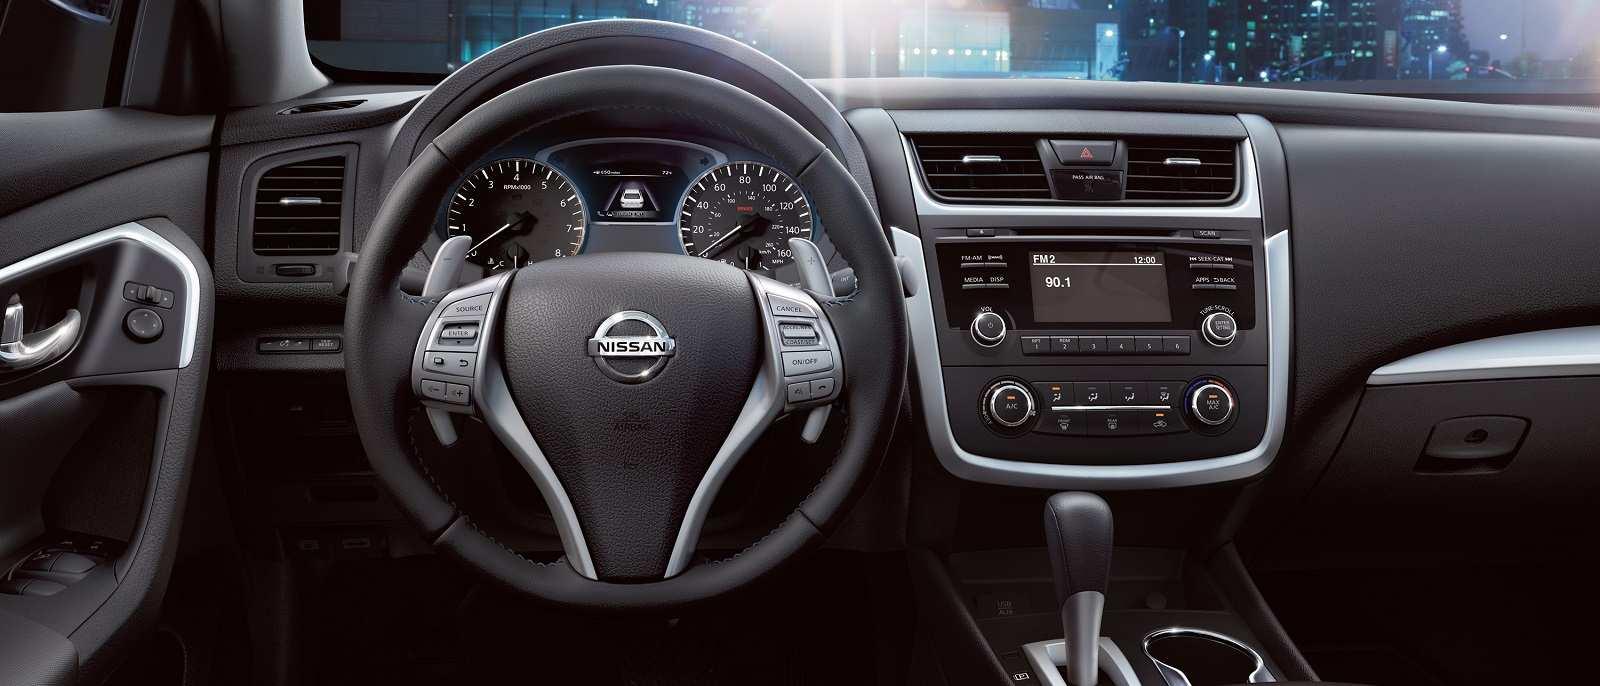 80 New Nissan Altima Interior New Concept by Nissan Altima Interior